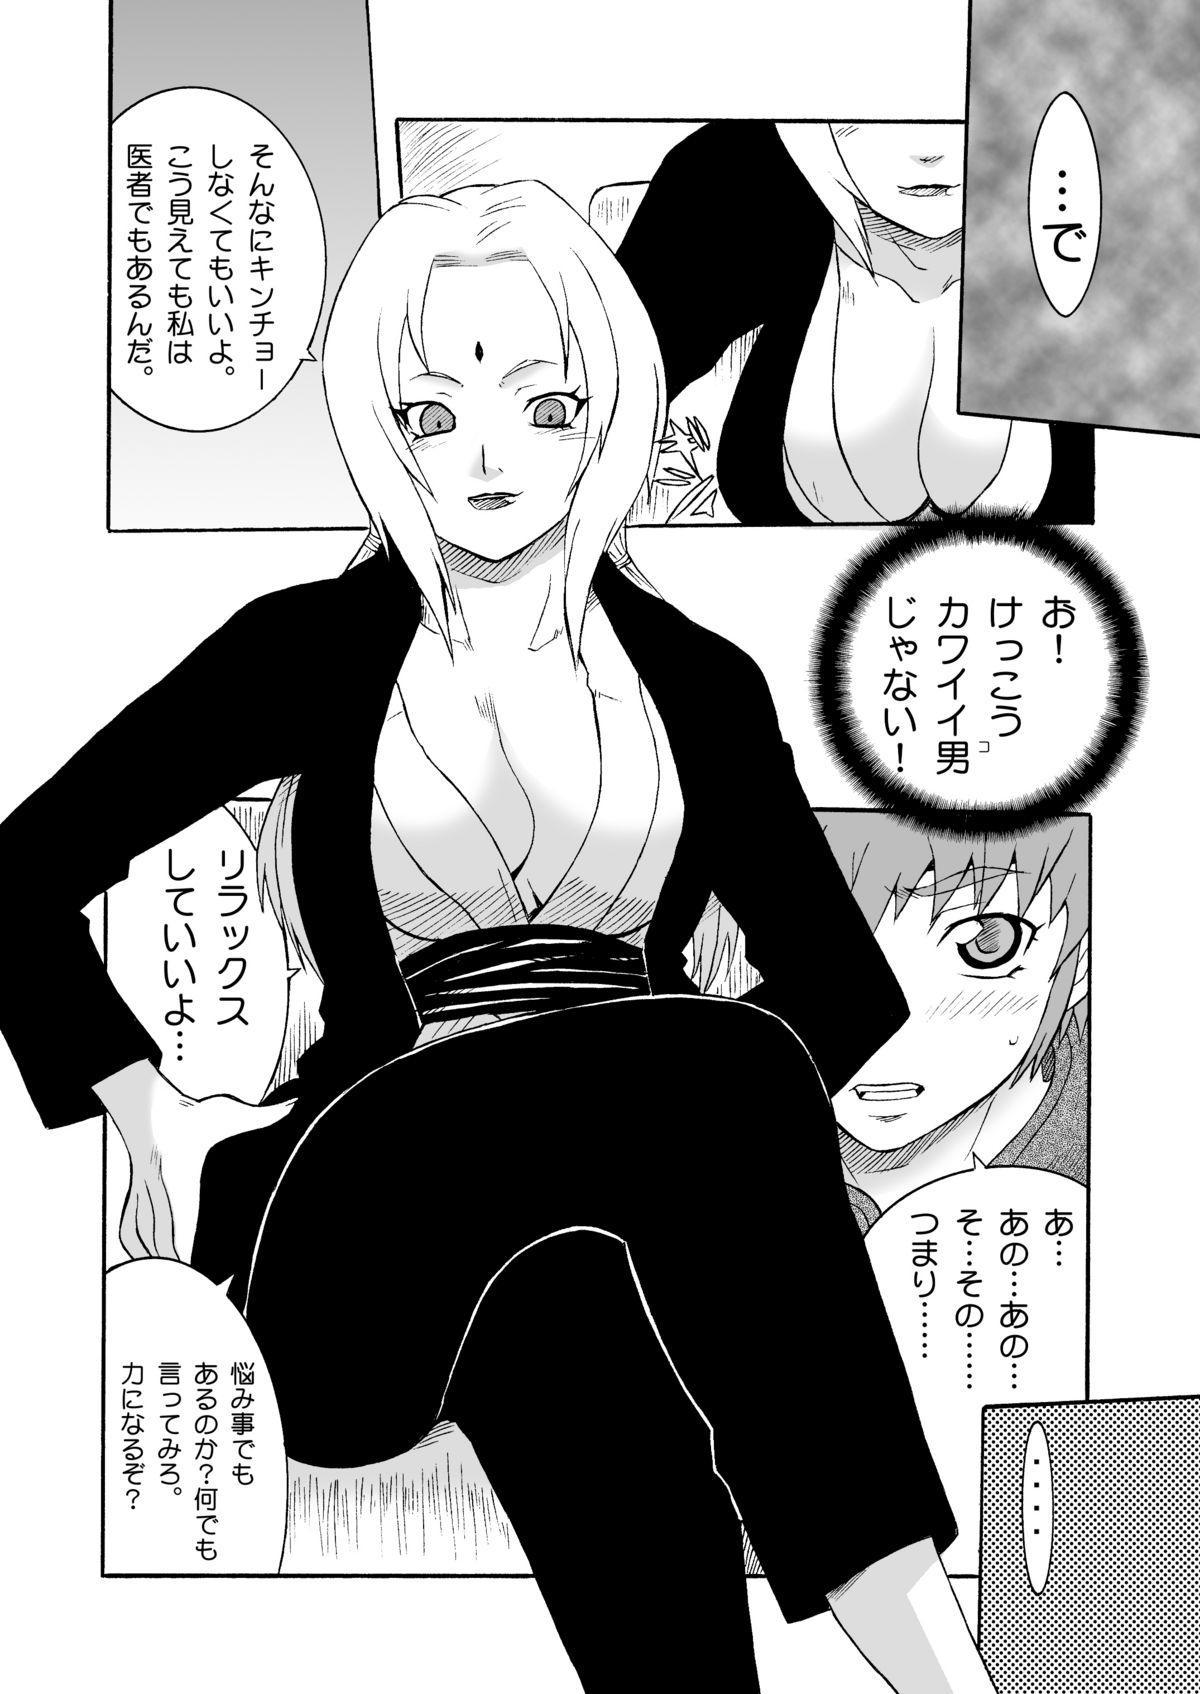 [MG WORKS (Isou Doubaku) Q.N.T DL (Naruto) [Digital] 36